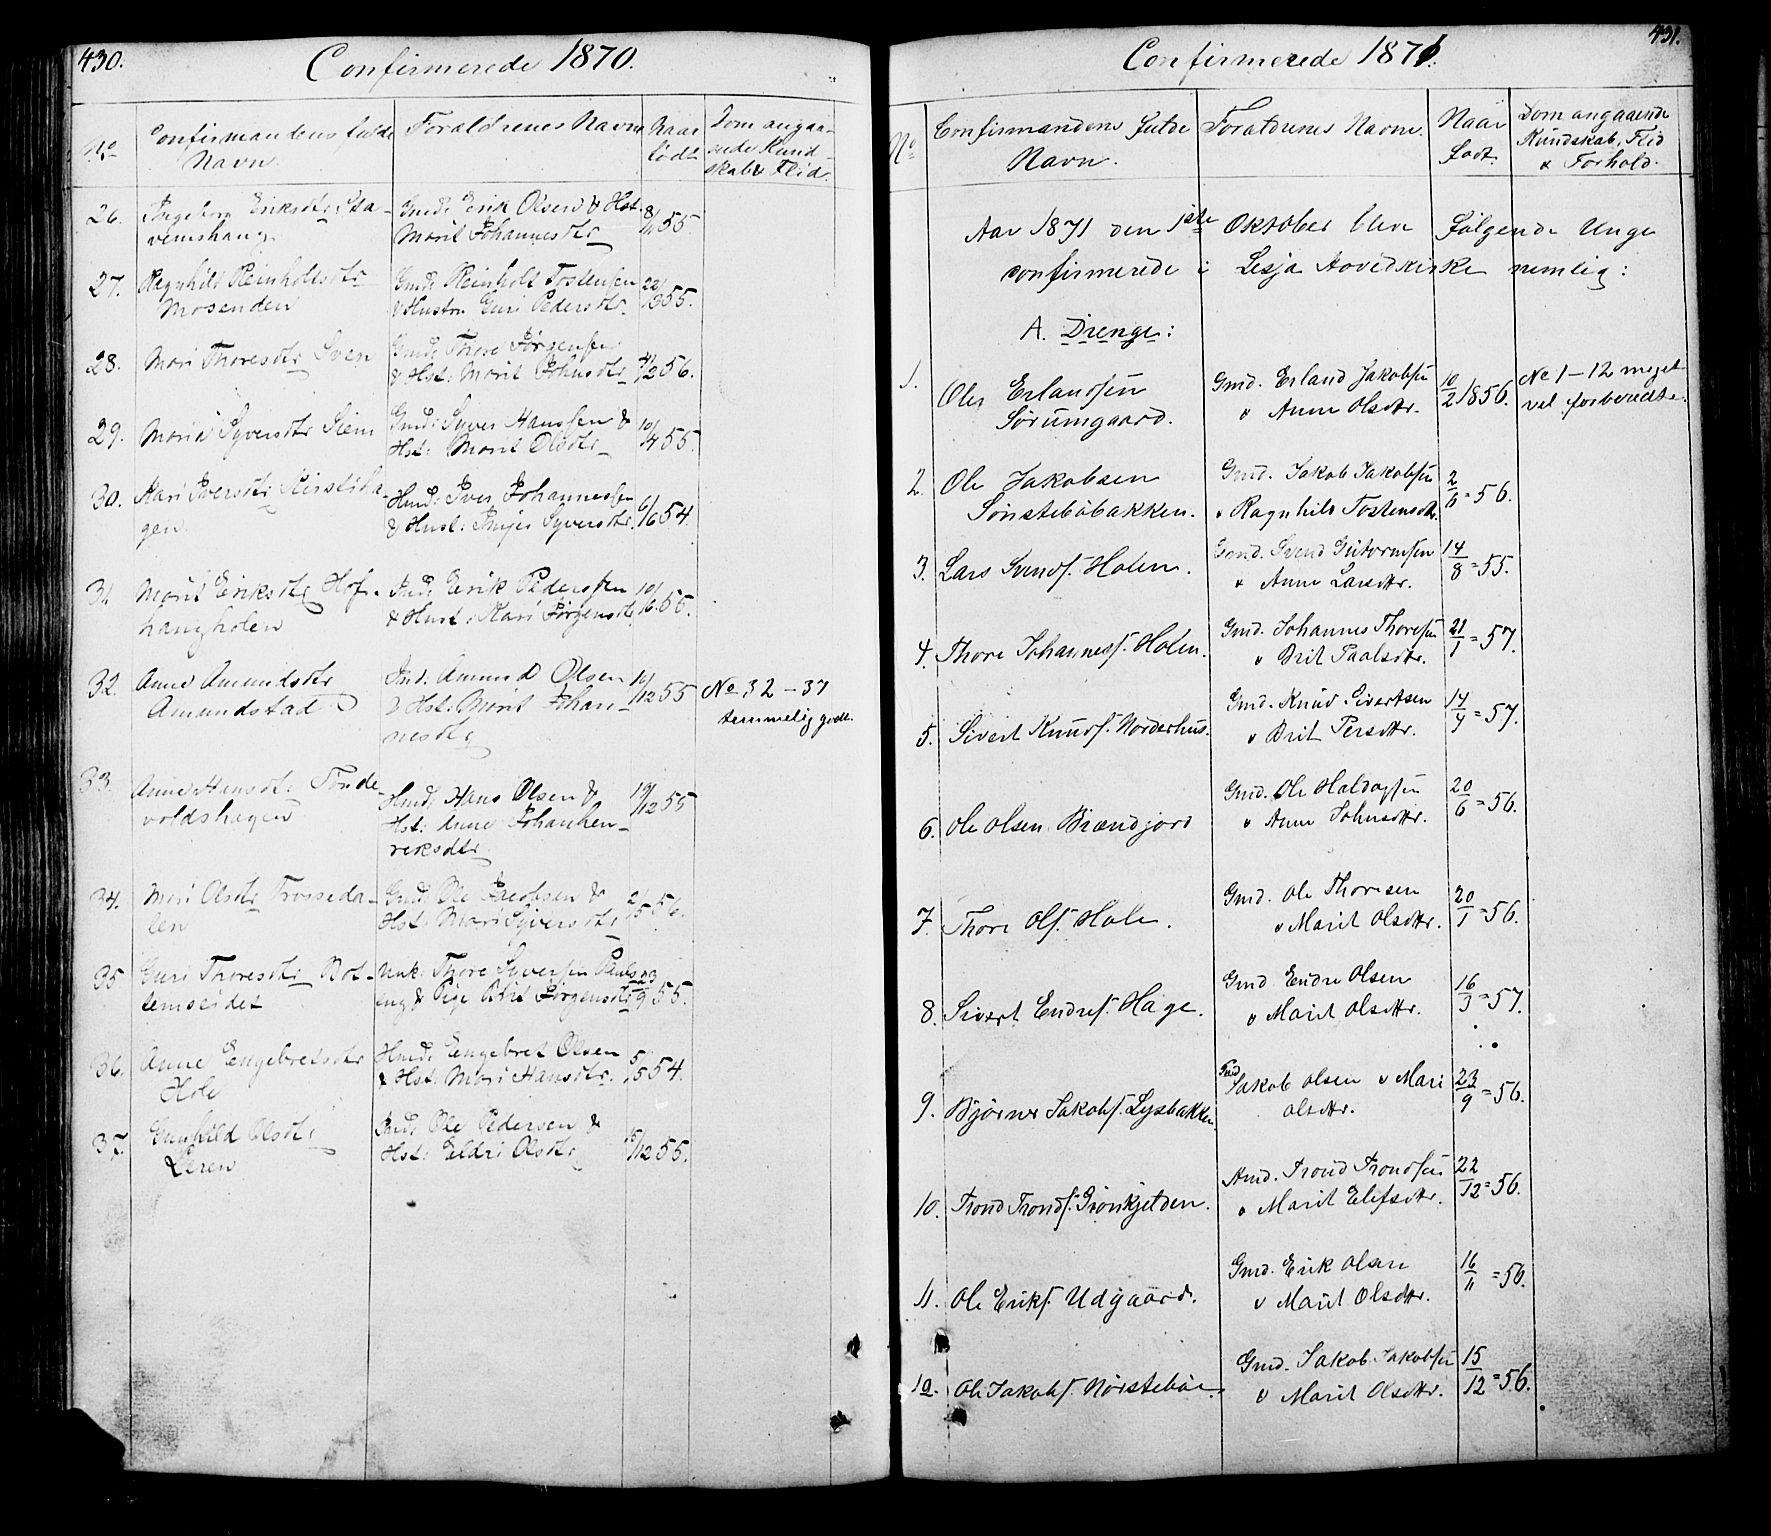 SAH, Lesja prestekontor, Klokkerbok nr. 5, 1850-1894, s. 430-431